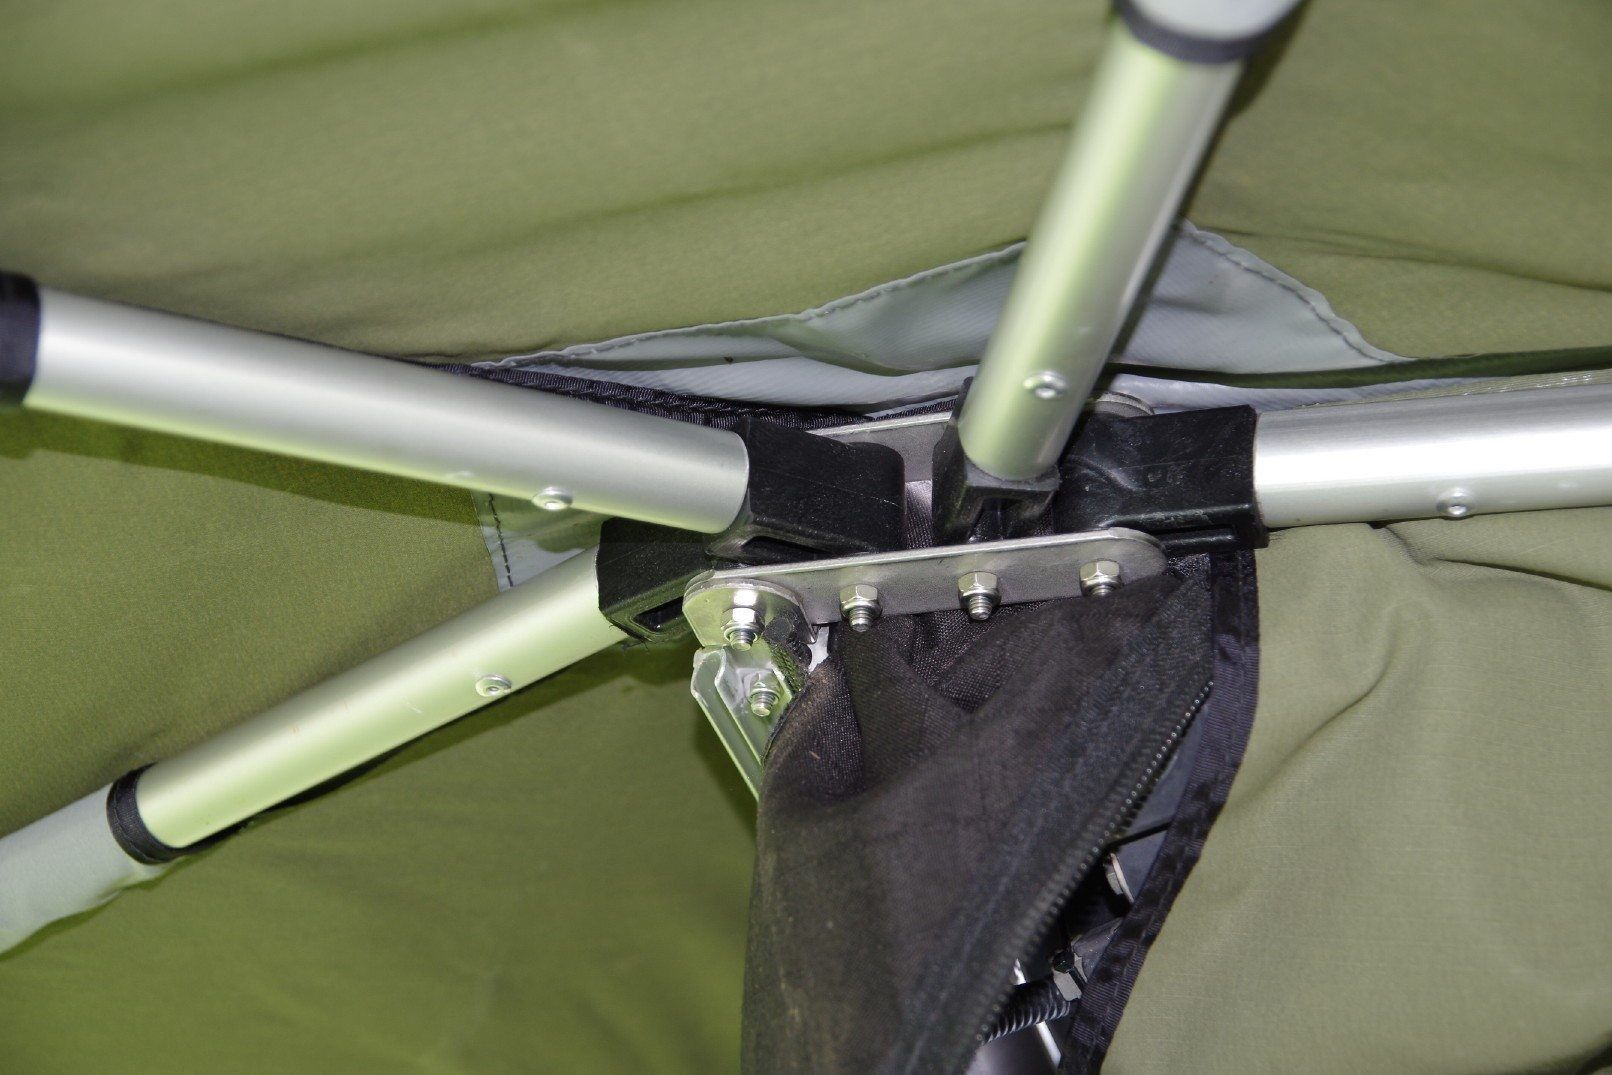 Spare Bracket For Rapid Wing Awning Con Imagenes Campistas Felices Casa Rodante Iveco Daily 4x4